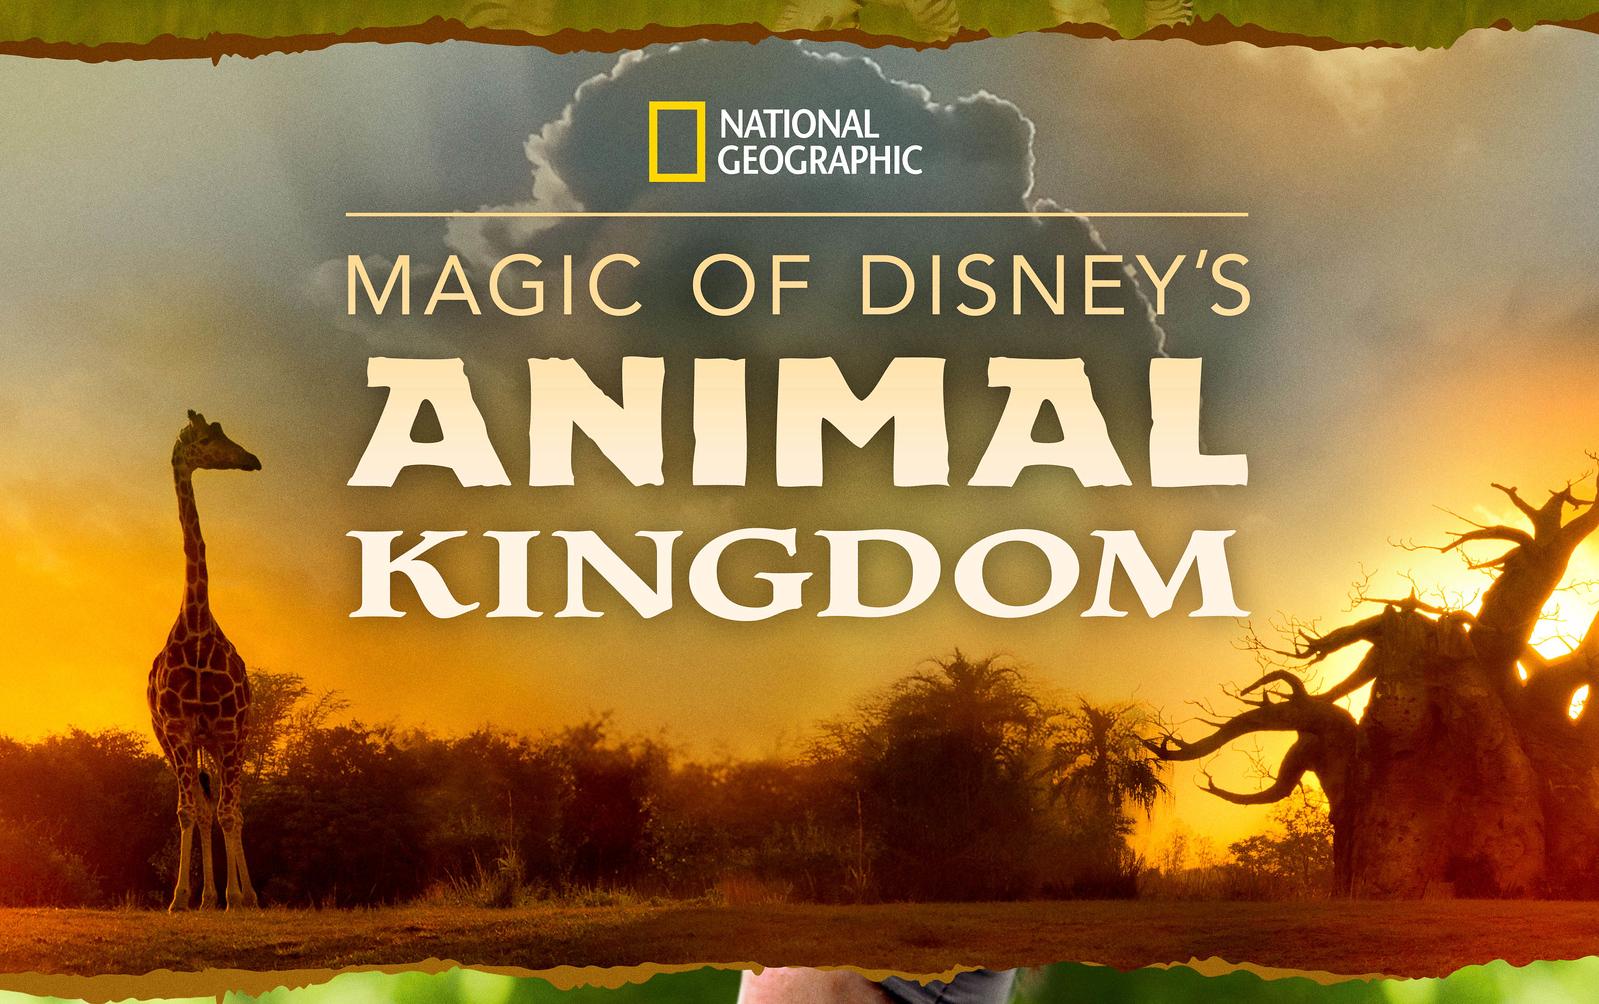 F01_NG_AnimalKingdom_keyart_13 5x20_Dated-cover